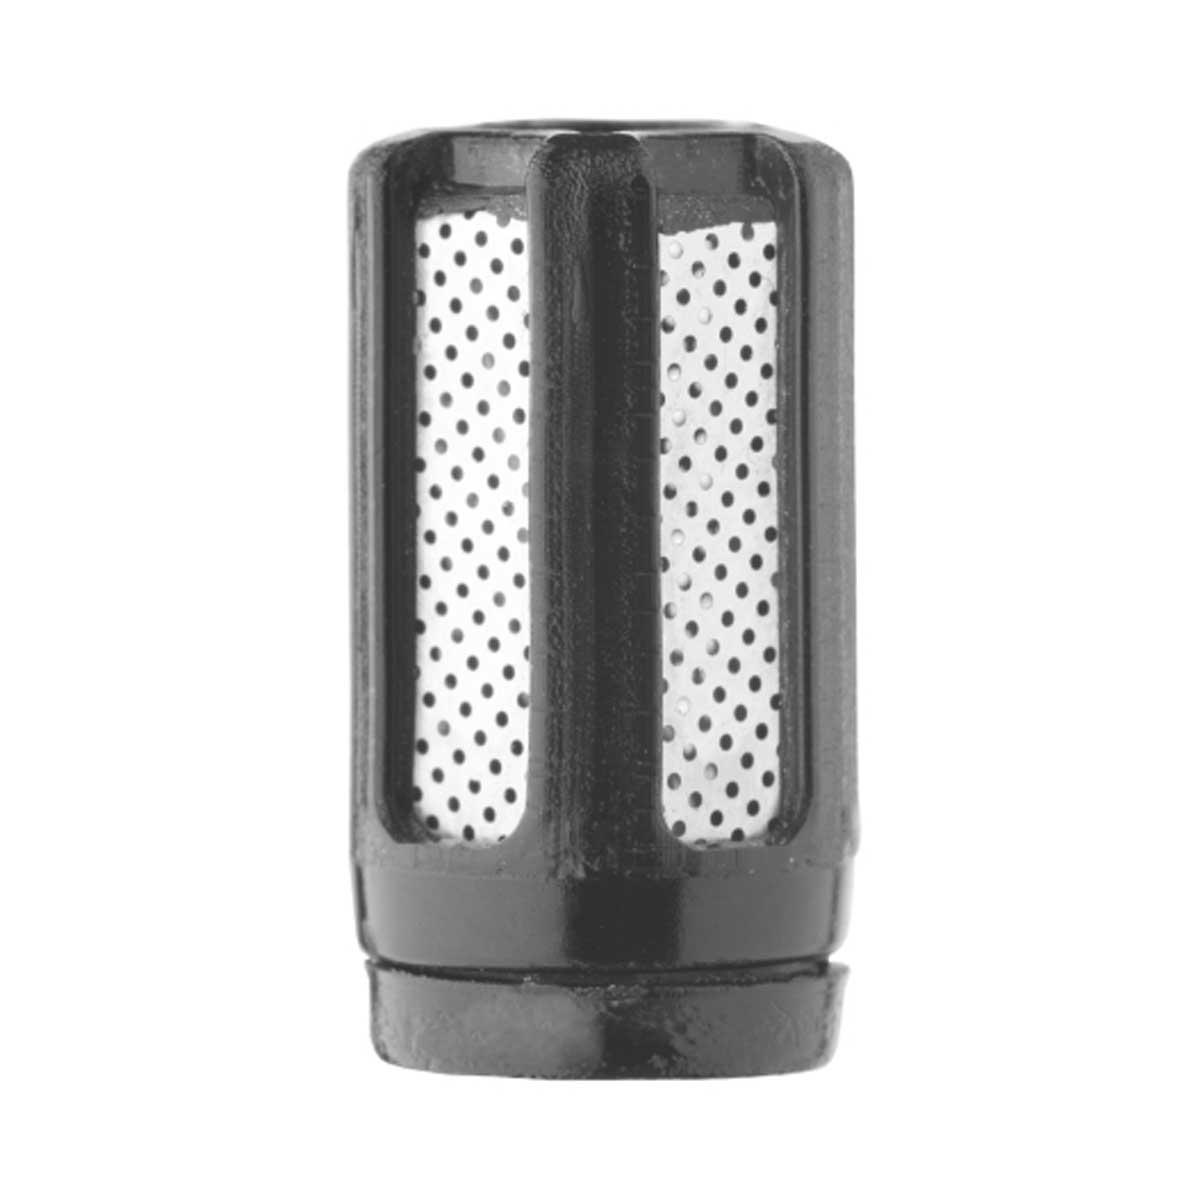 AKG エーケージー / WM81 WIREMESH black 黒 (MicroLite Series カーディオイド・モデル用ワイヤーメッシュキャップ) 5個入り【お取り寄せ商品】